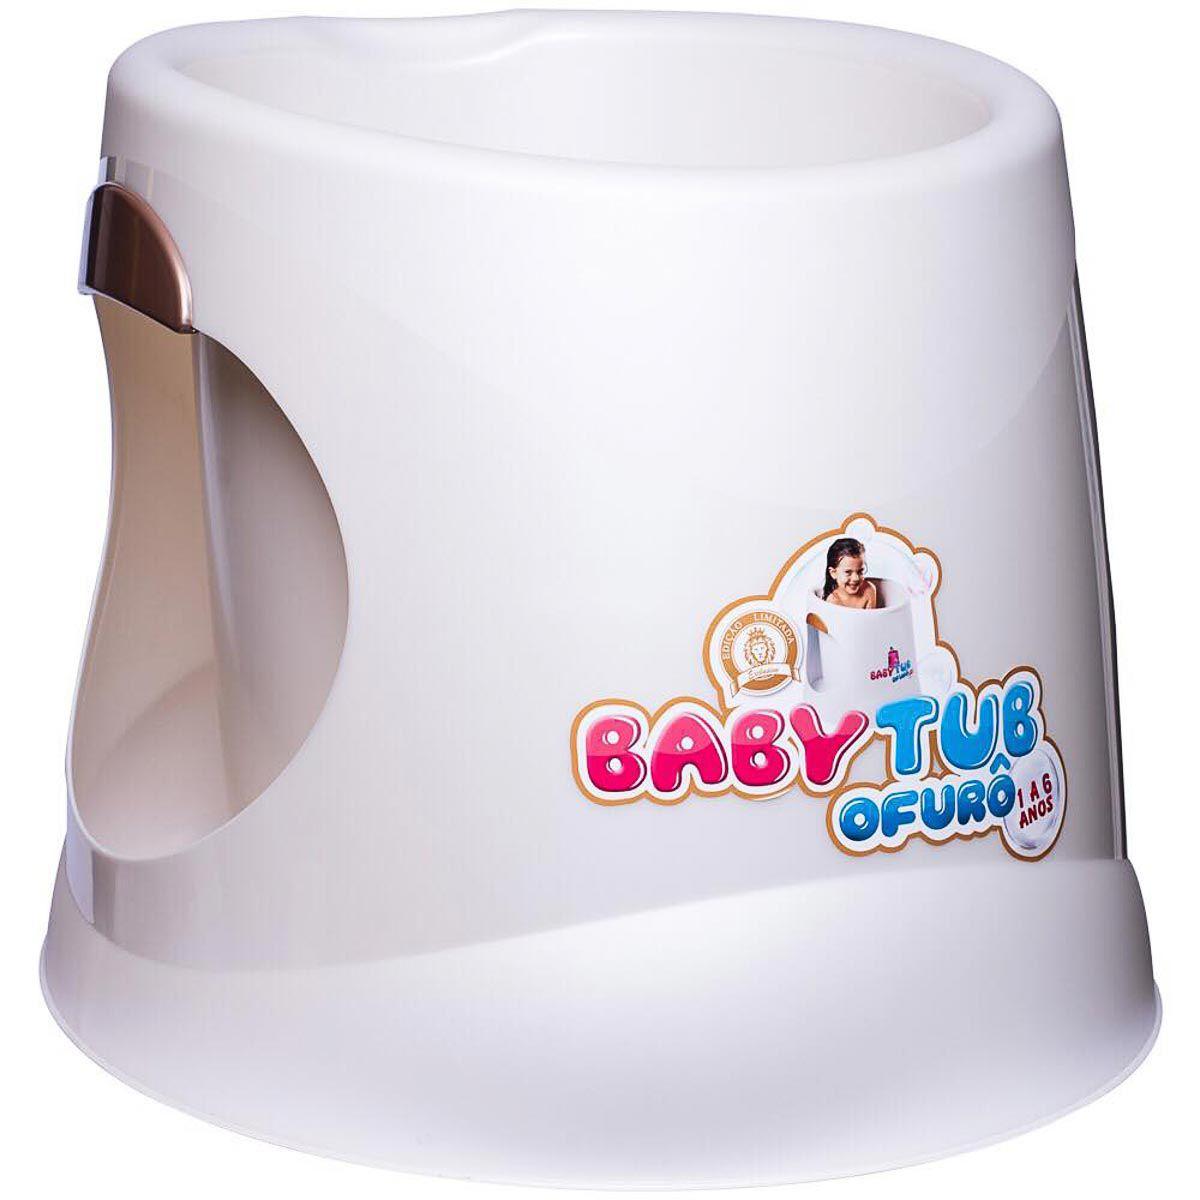 Banheira Ofurô Pérola - Baby Tub